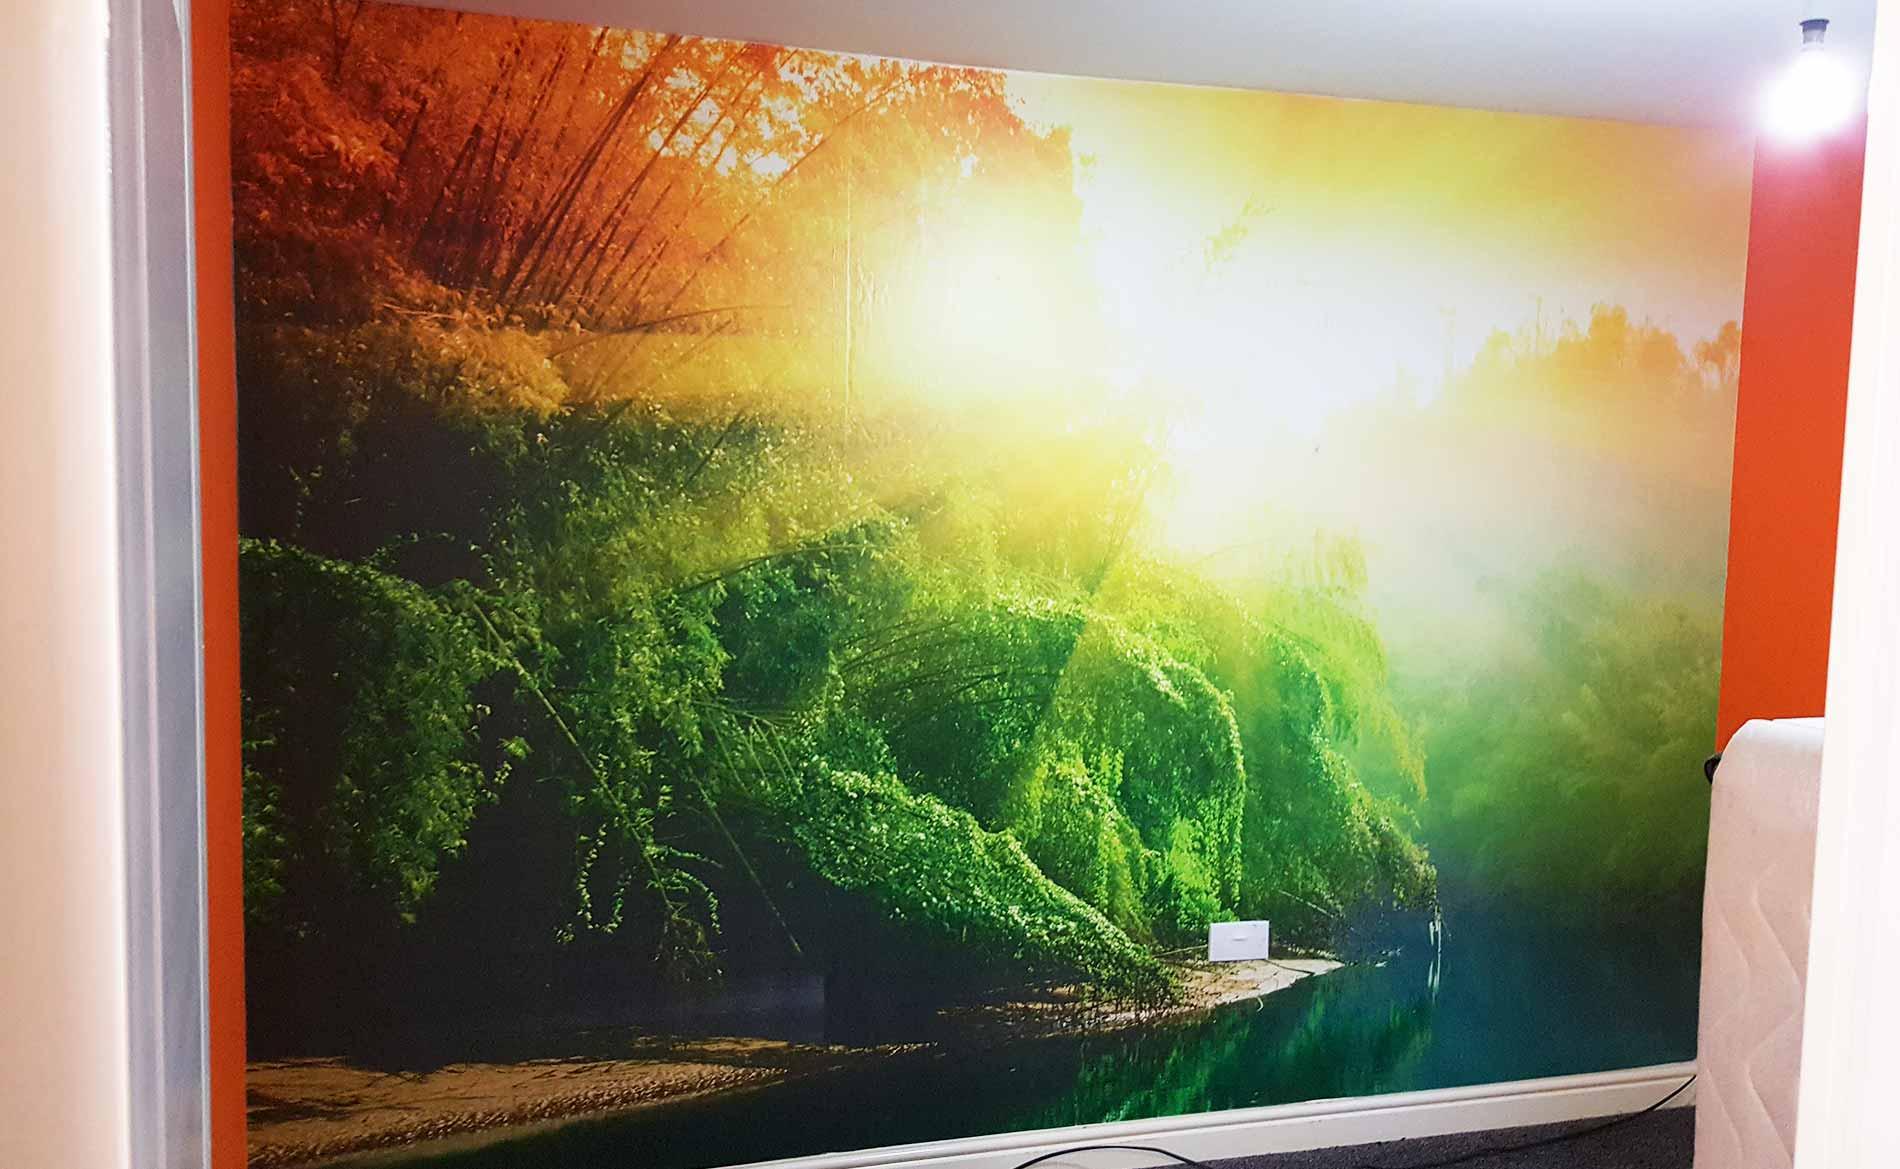 Wallpaper & Coverings, Custom Bedroom Wallpaper, Signage, Stoke-on-Trent, Staffordshire